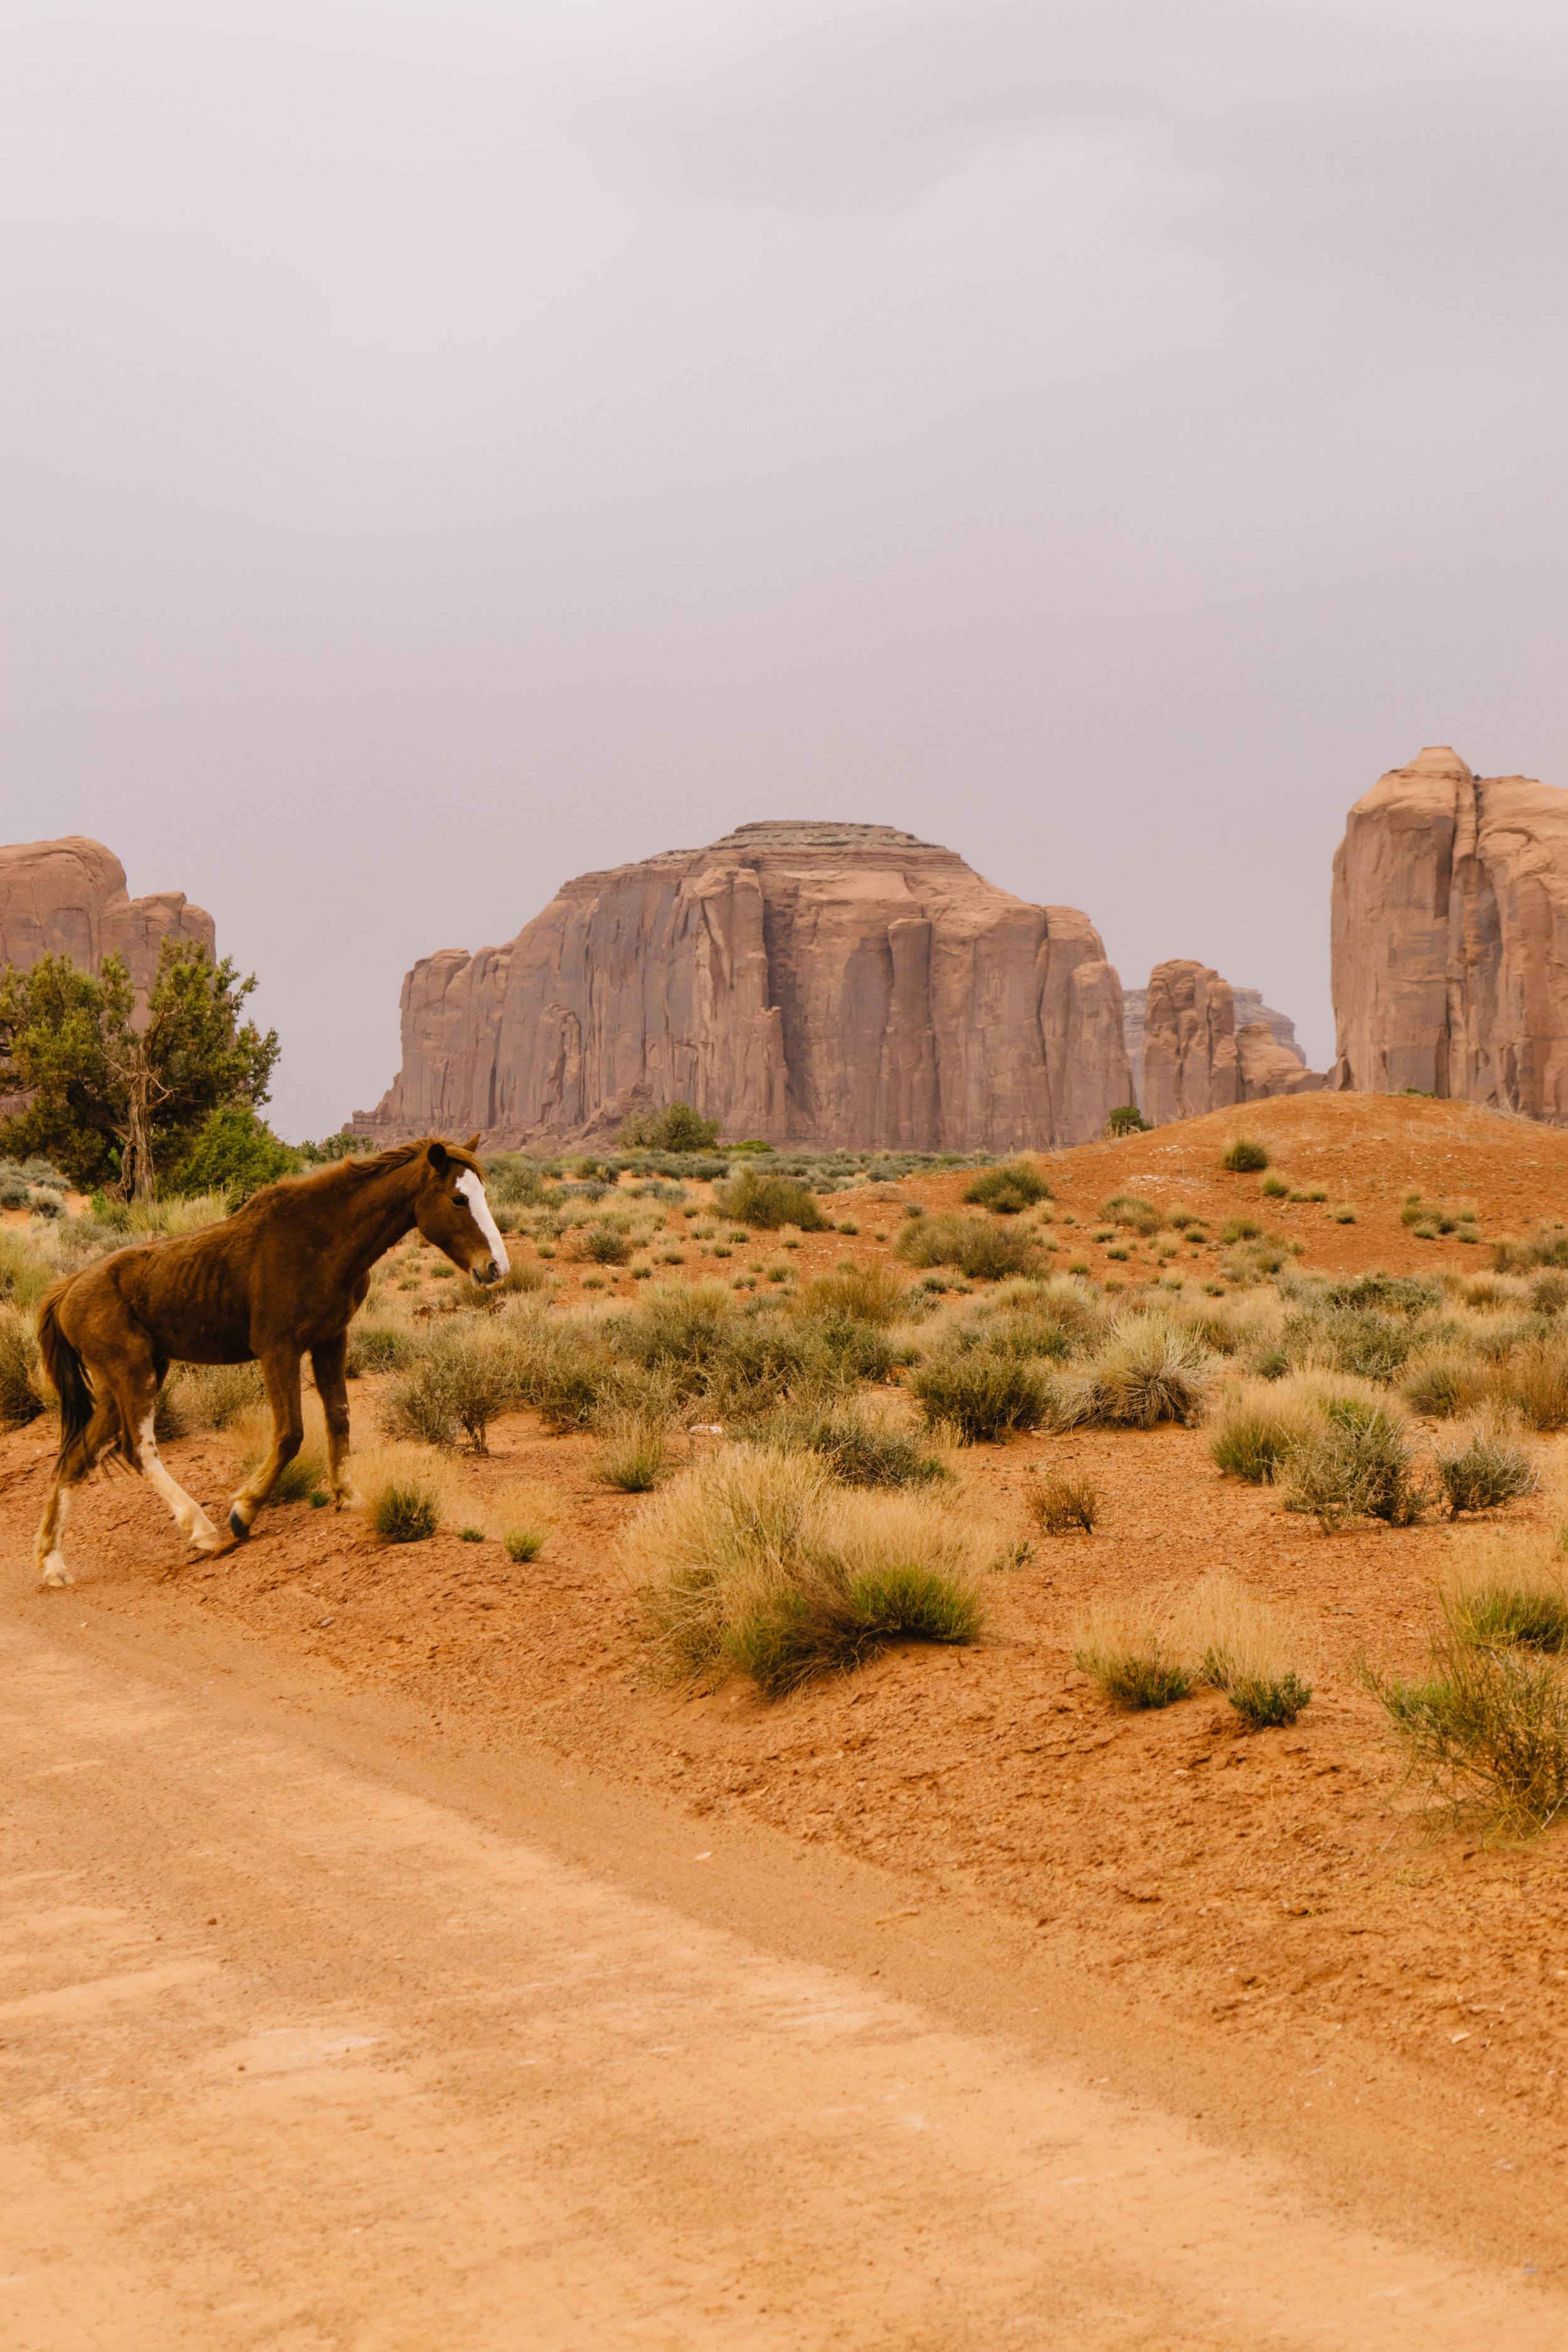 More almost-wild horses!